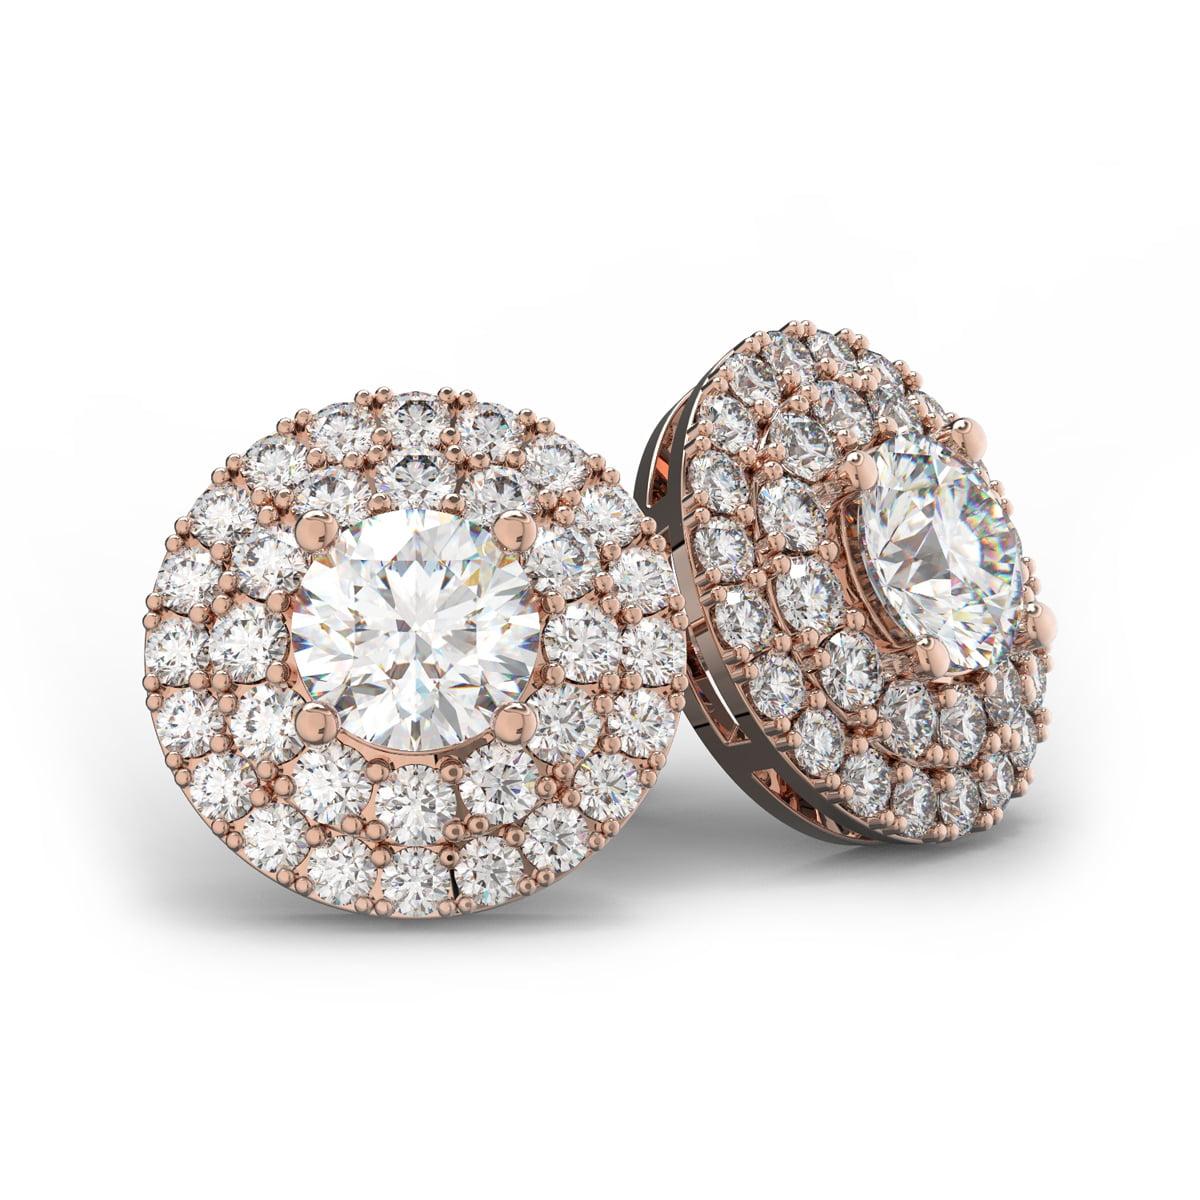 14K Rose Gold 3 Carat Diamond Halo Stud Earrings